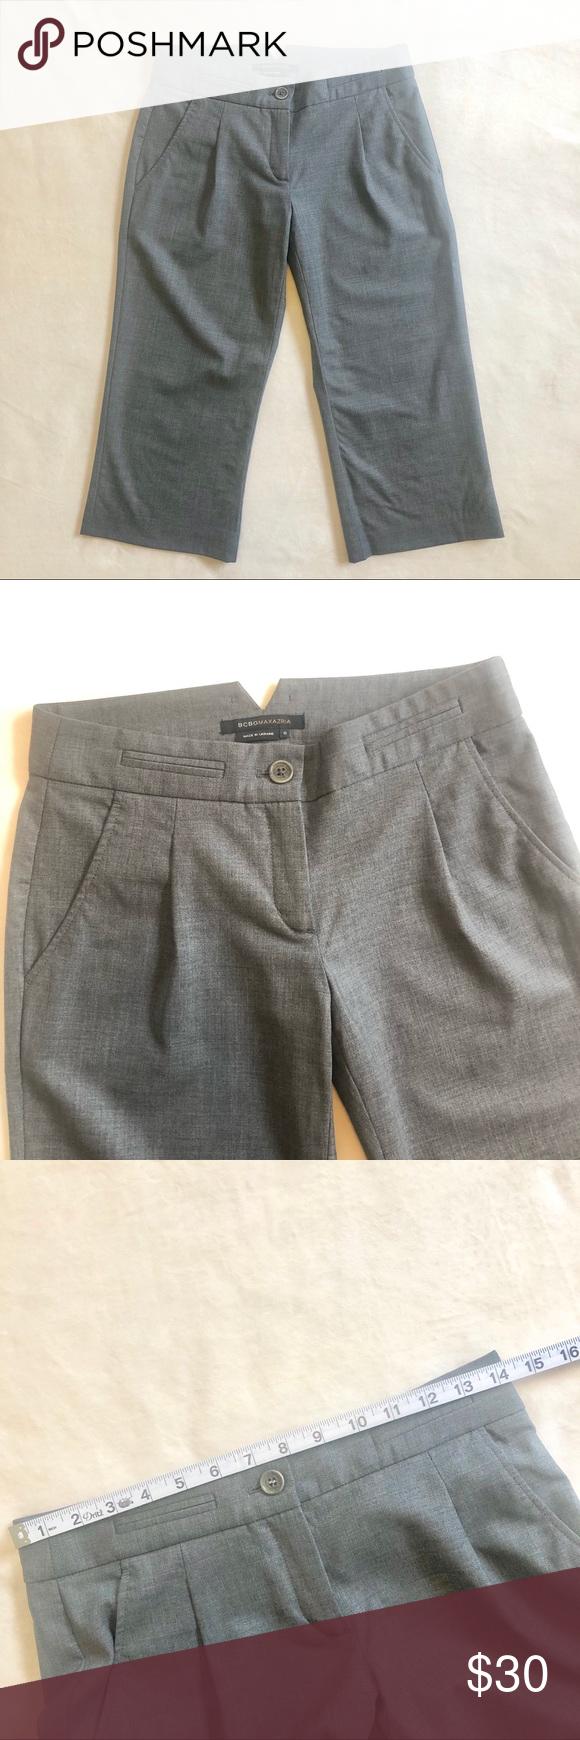 BCBGMaxAzria Collin grey cropped pants EUC size 0 BCBGMAXAZRIA